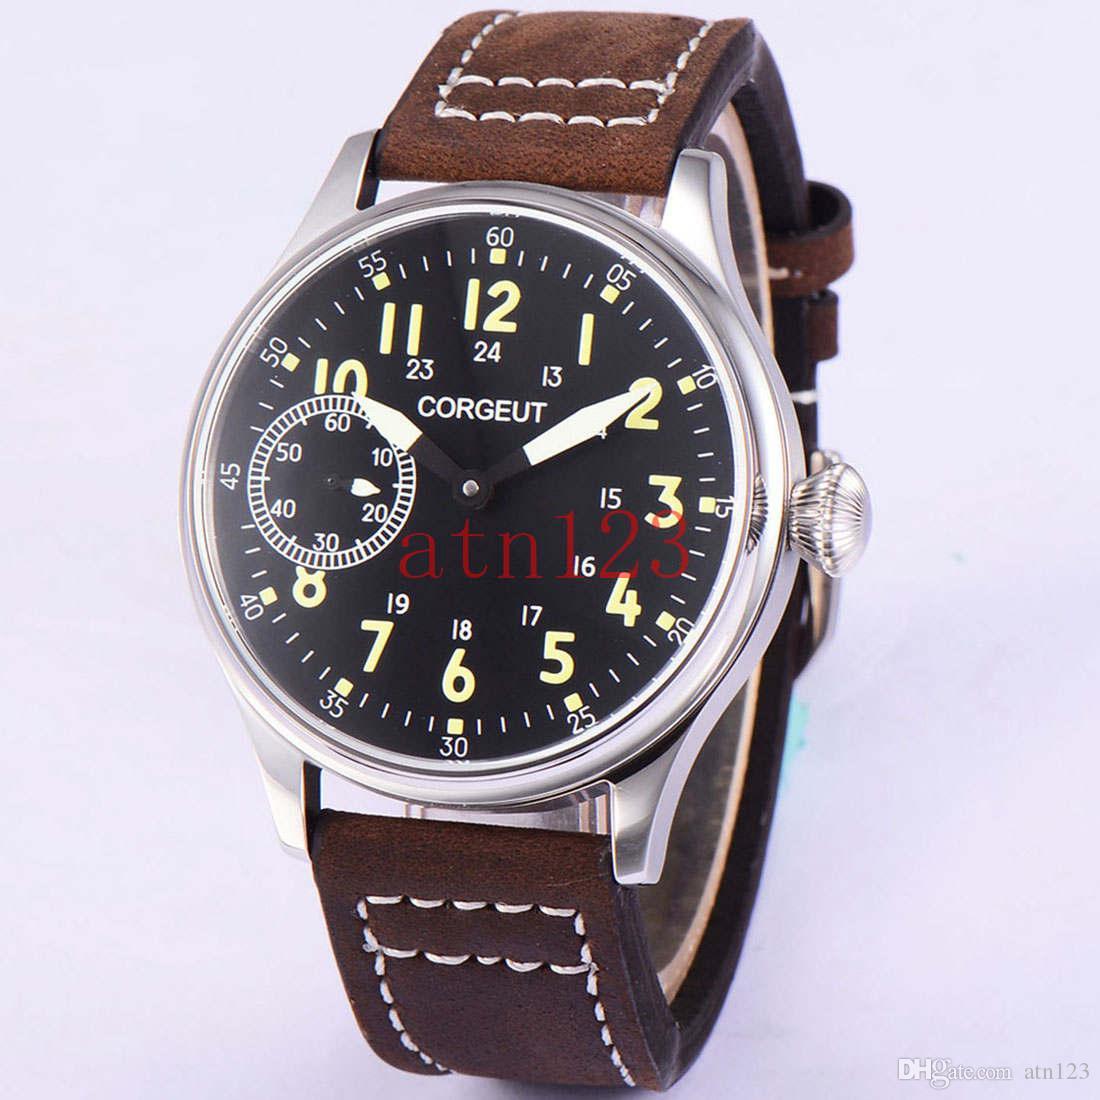 306ba153e16 Compre Corgeut 44mm Dial Preto Vintage Hand Winding 6497 Mechanical Mens  Watch 3ATM Water Resistance Rating Relógio De Pulso 1905 De Atn123